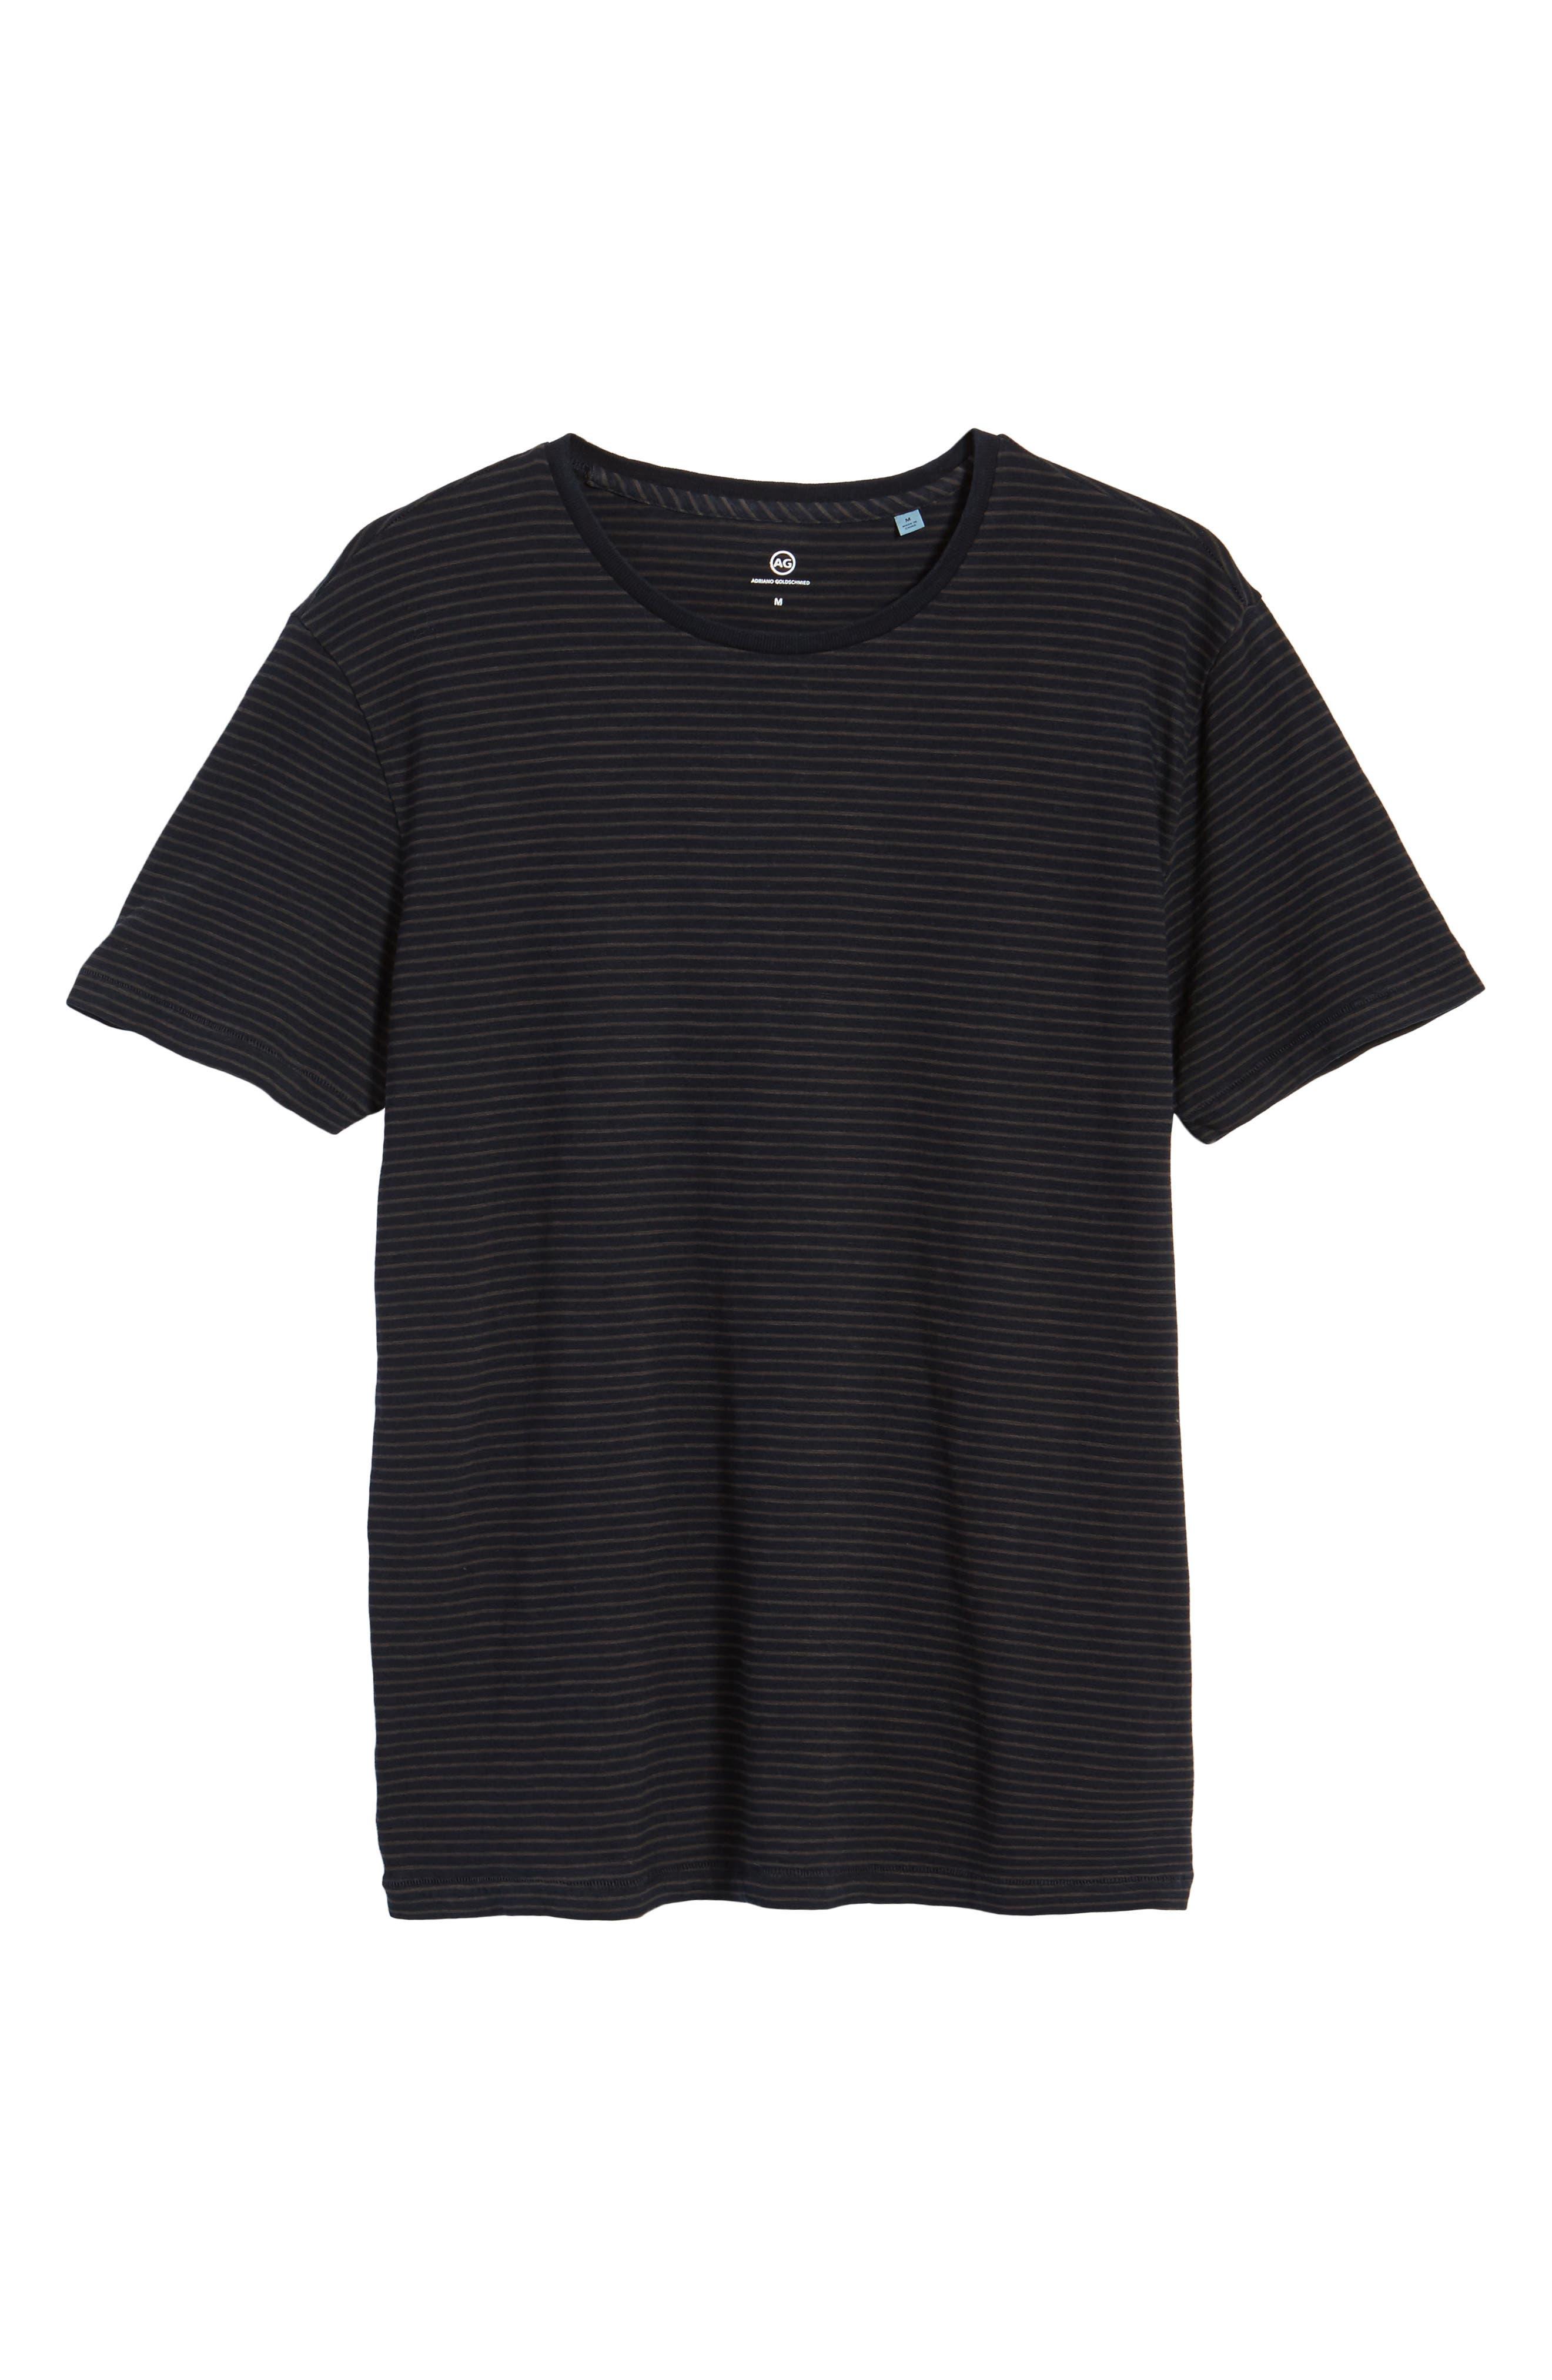 Julian Slim Fit Crewneck Shirt,                             Alternate thumbnail 17, color,